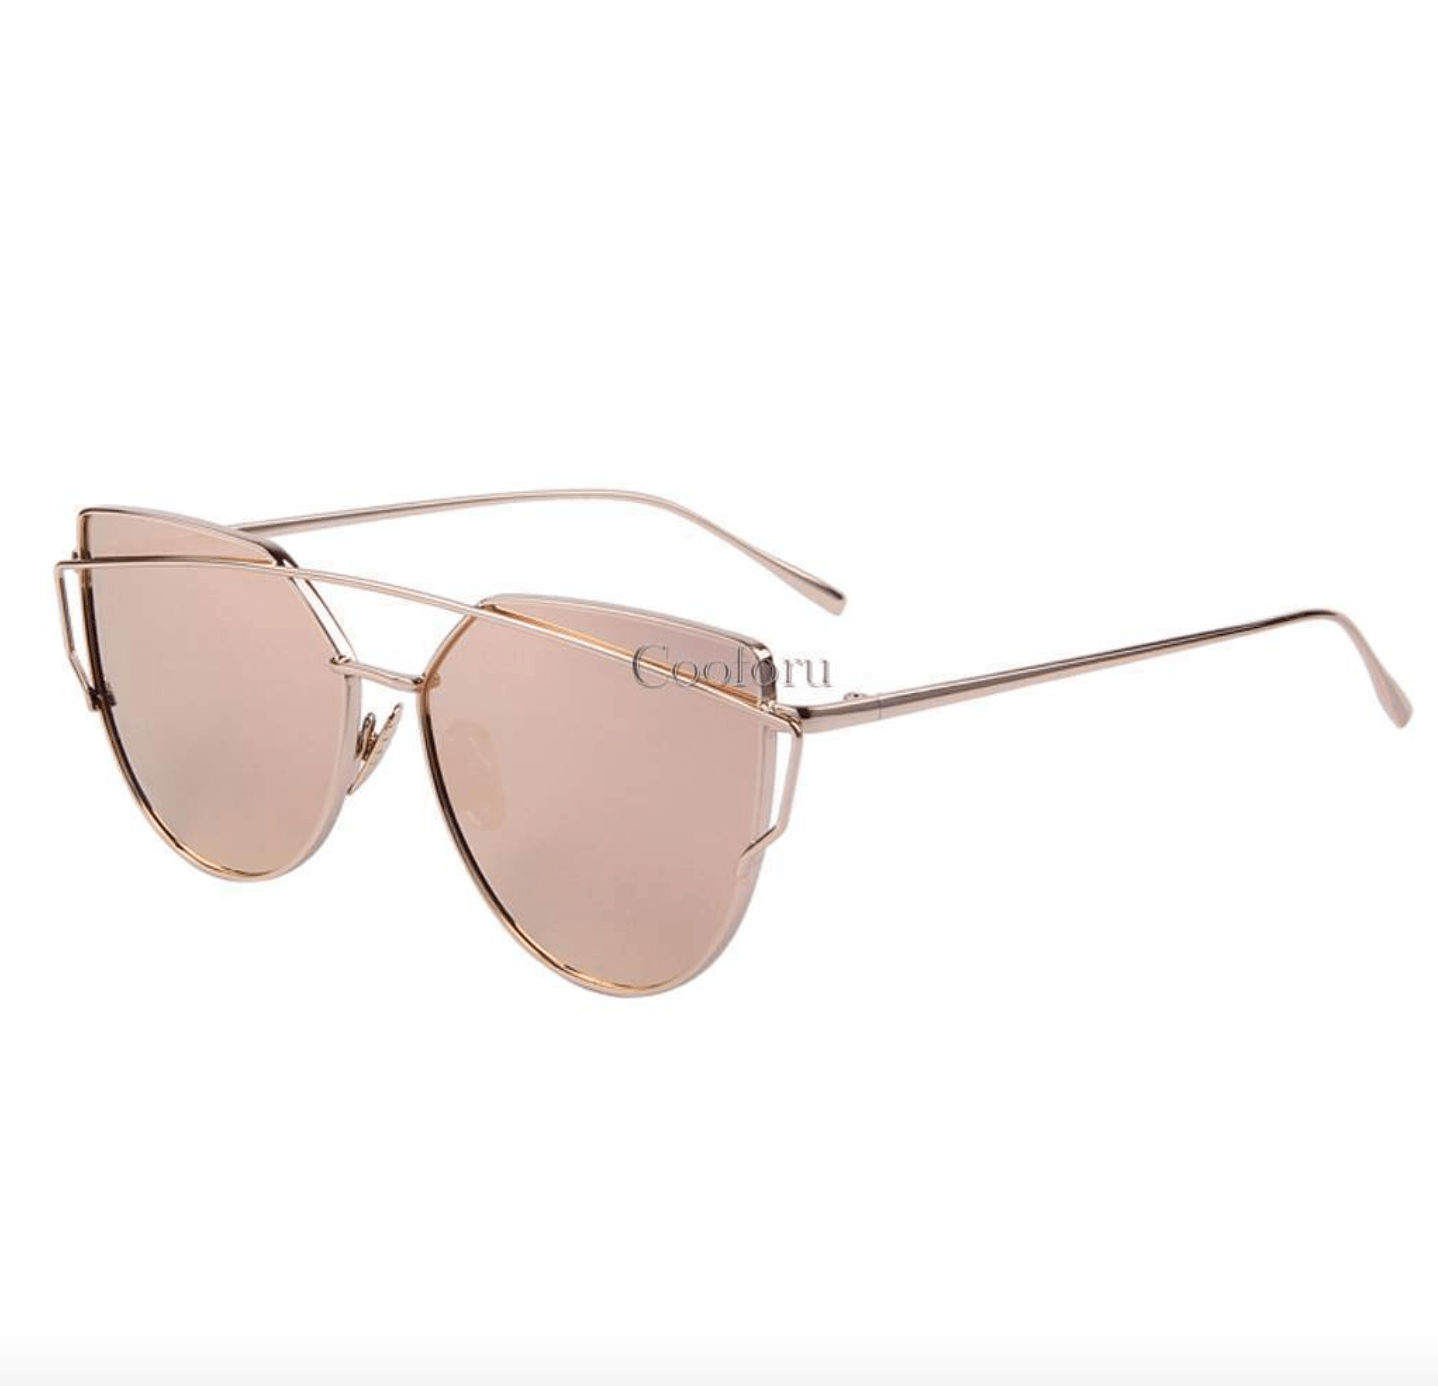 lunettes de soleil cat eye effet cristal selection lunettes soleil summer 2017 cremeecoco. Black Bedroom Furniture Sets. Home Design Ideas